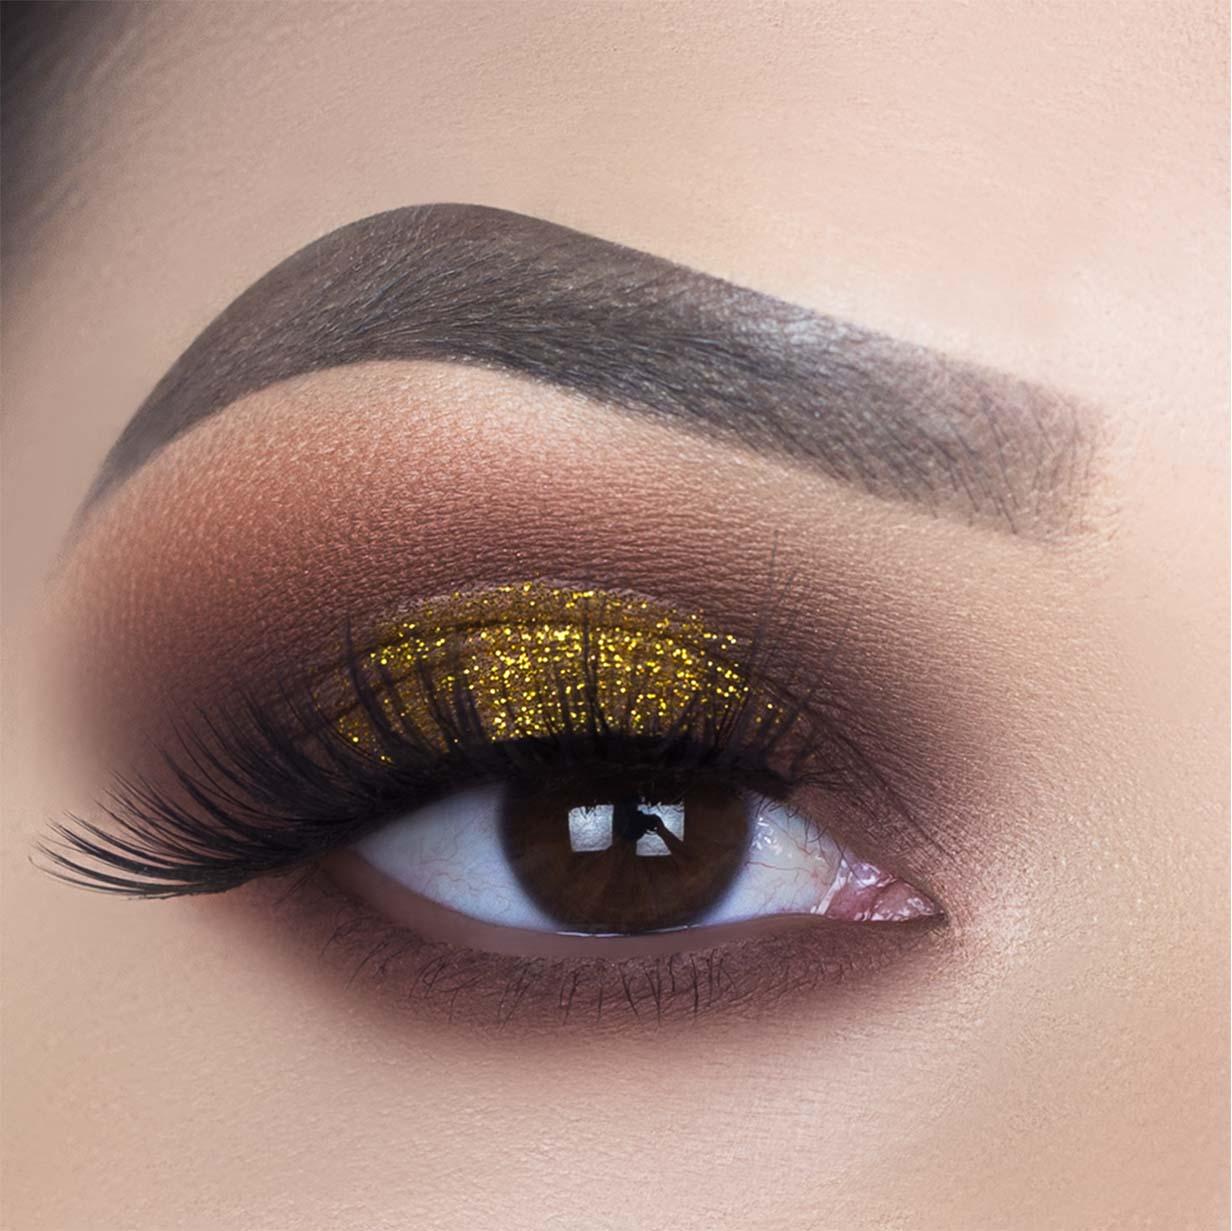 Asa de Borboleta Glitter Suelen Makeup Moscou  - SUELEN MAKEUP